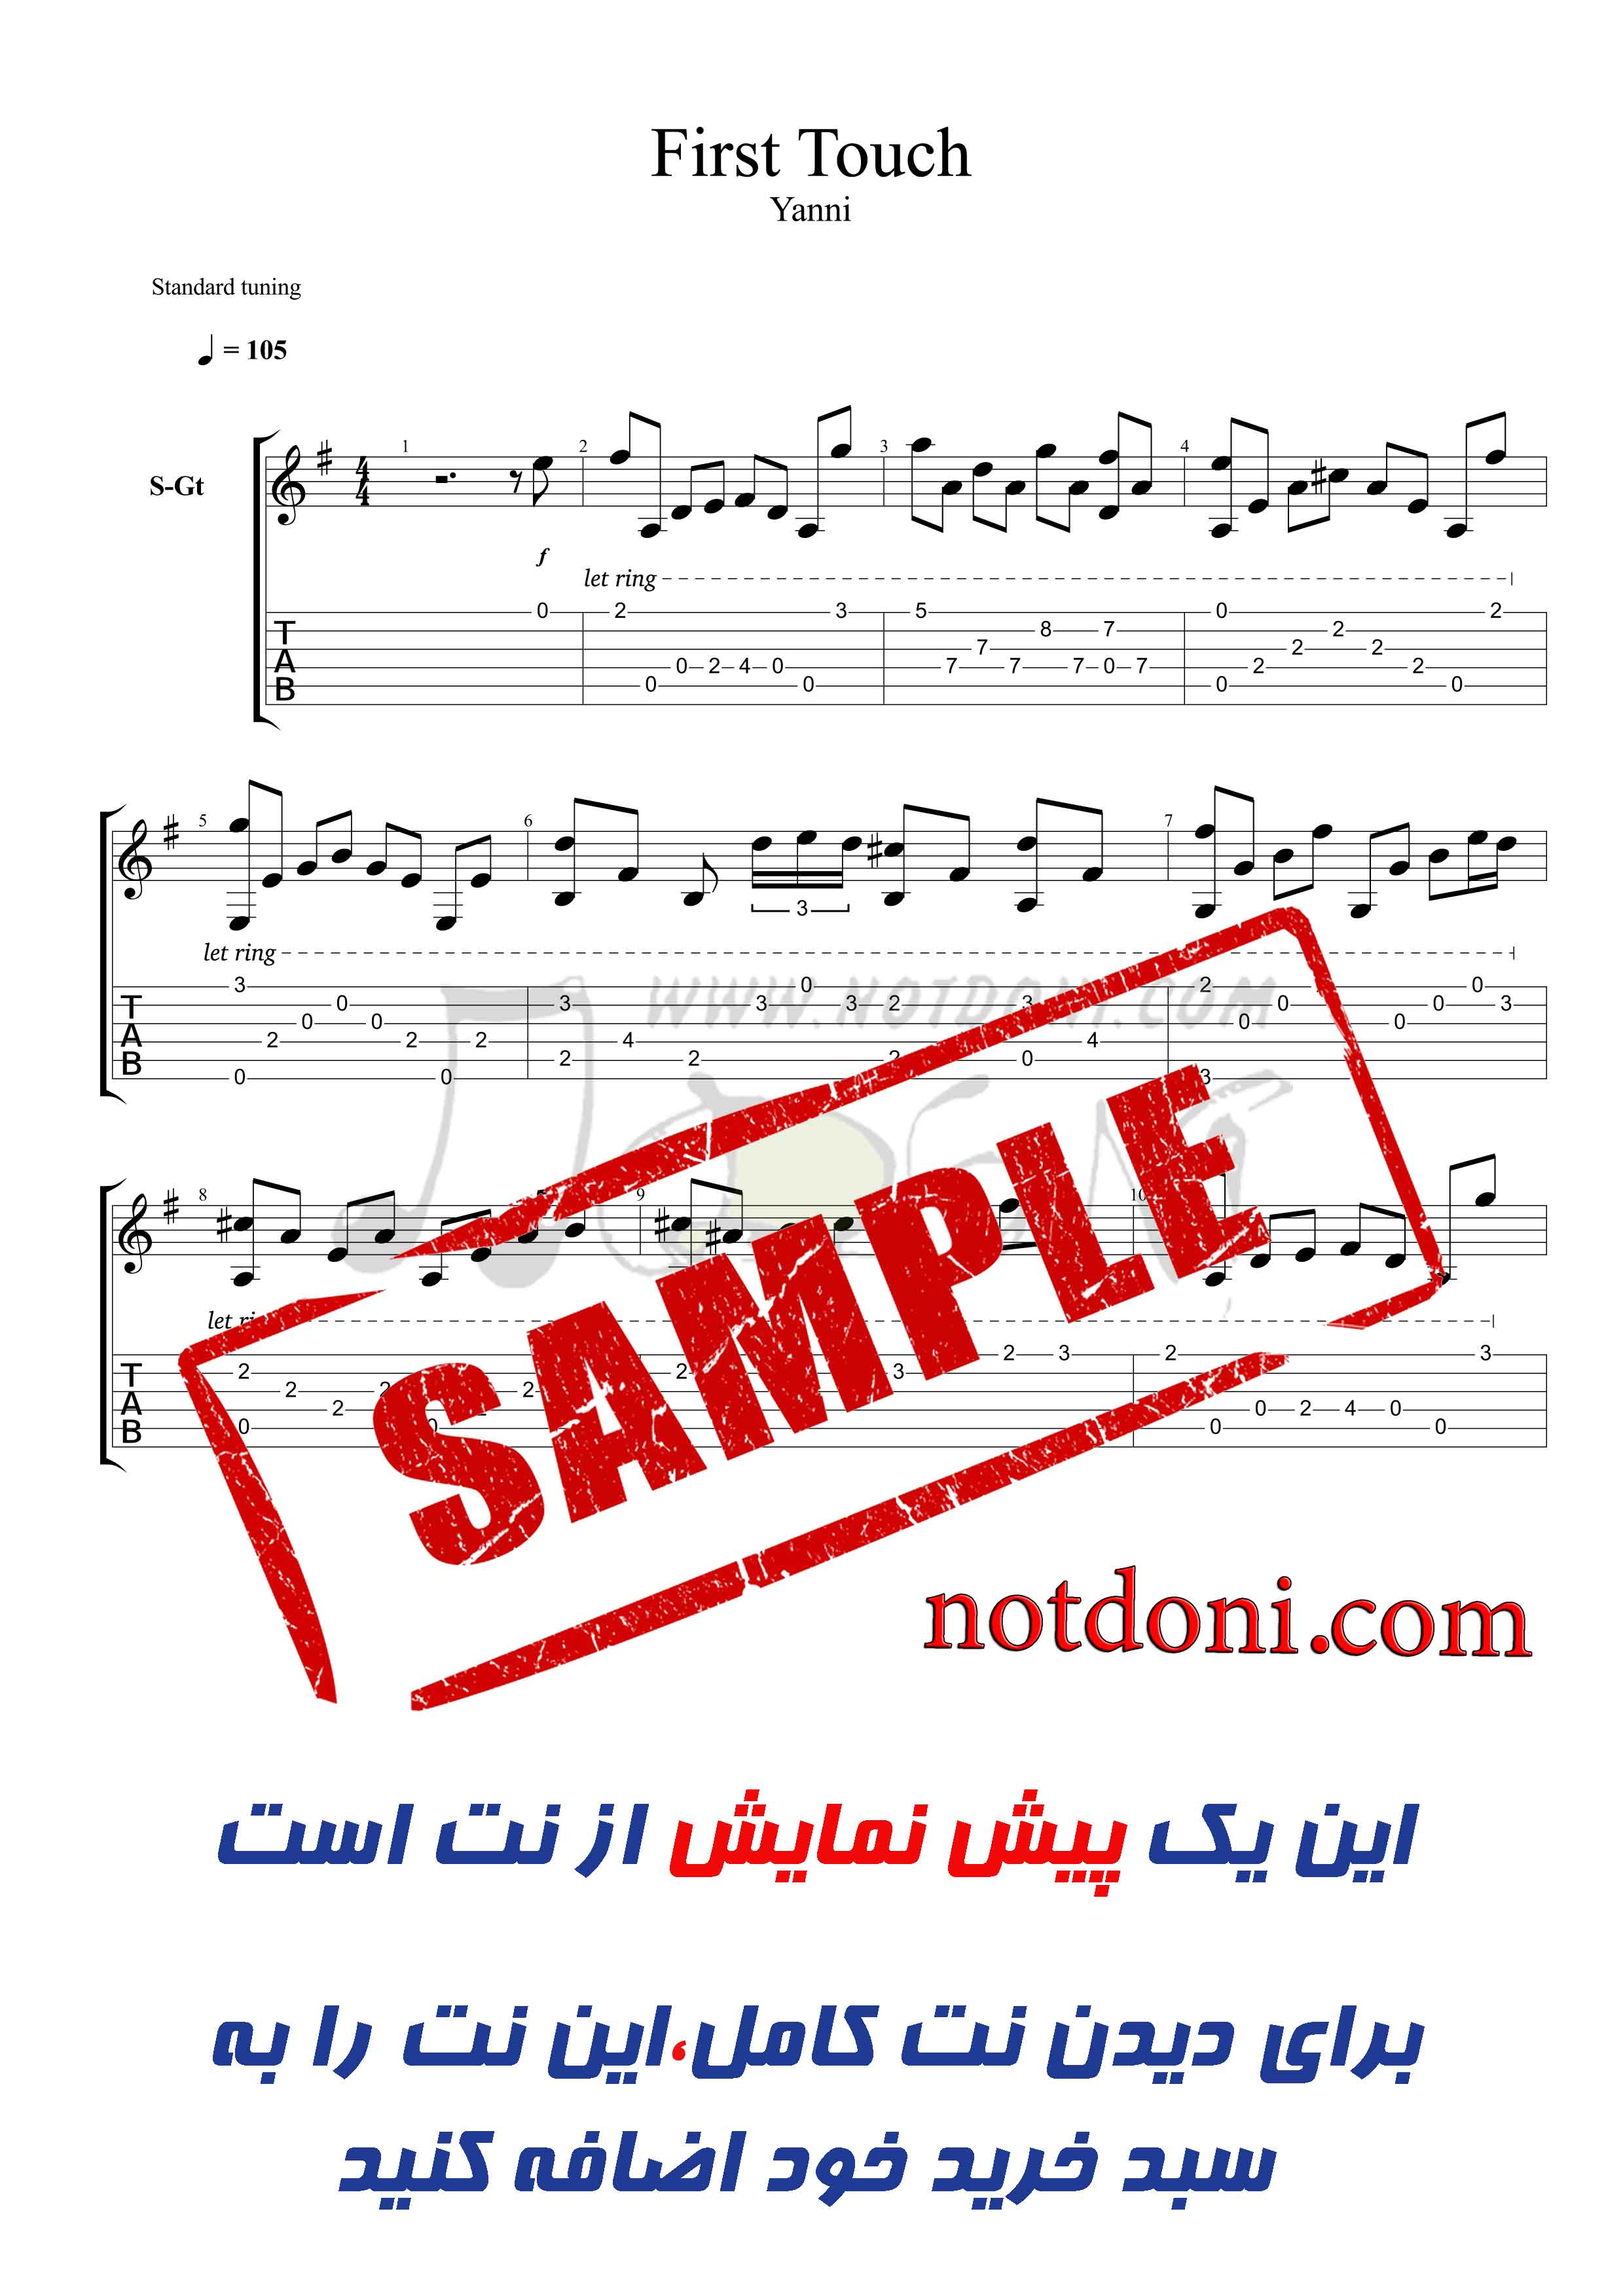 be6fa3d7-acc1-43e4-b10c-9506f9f4f3e7_دمو.jpg